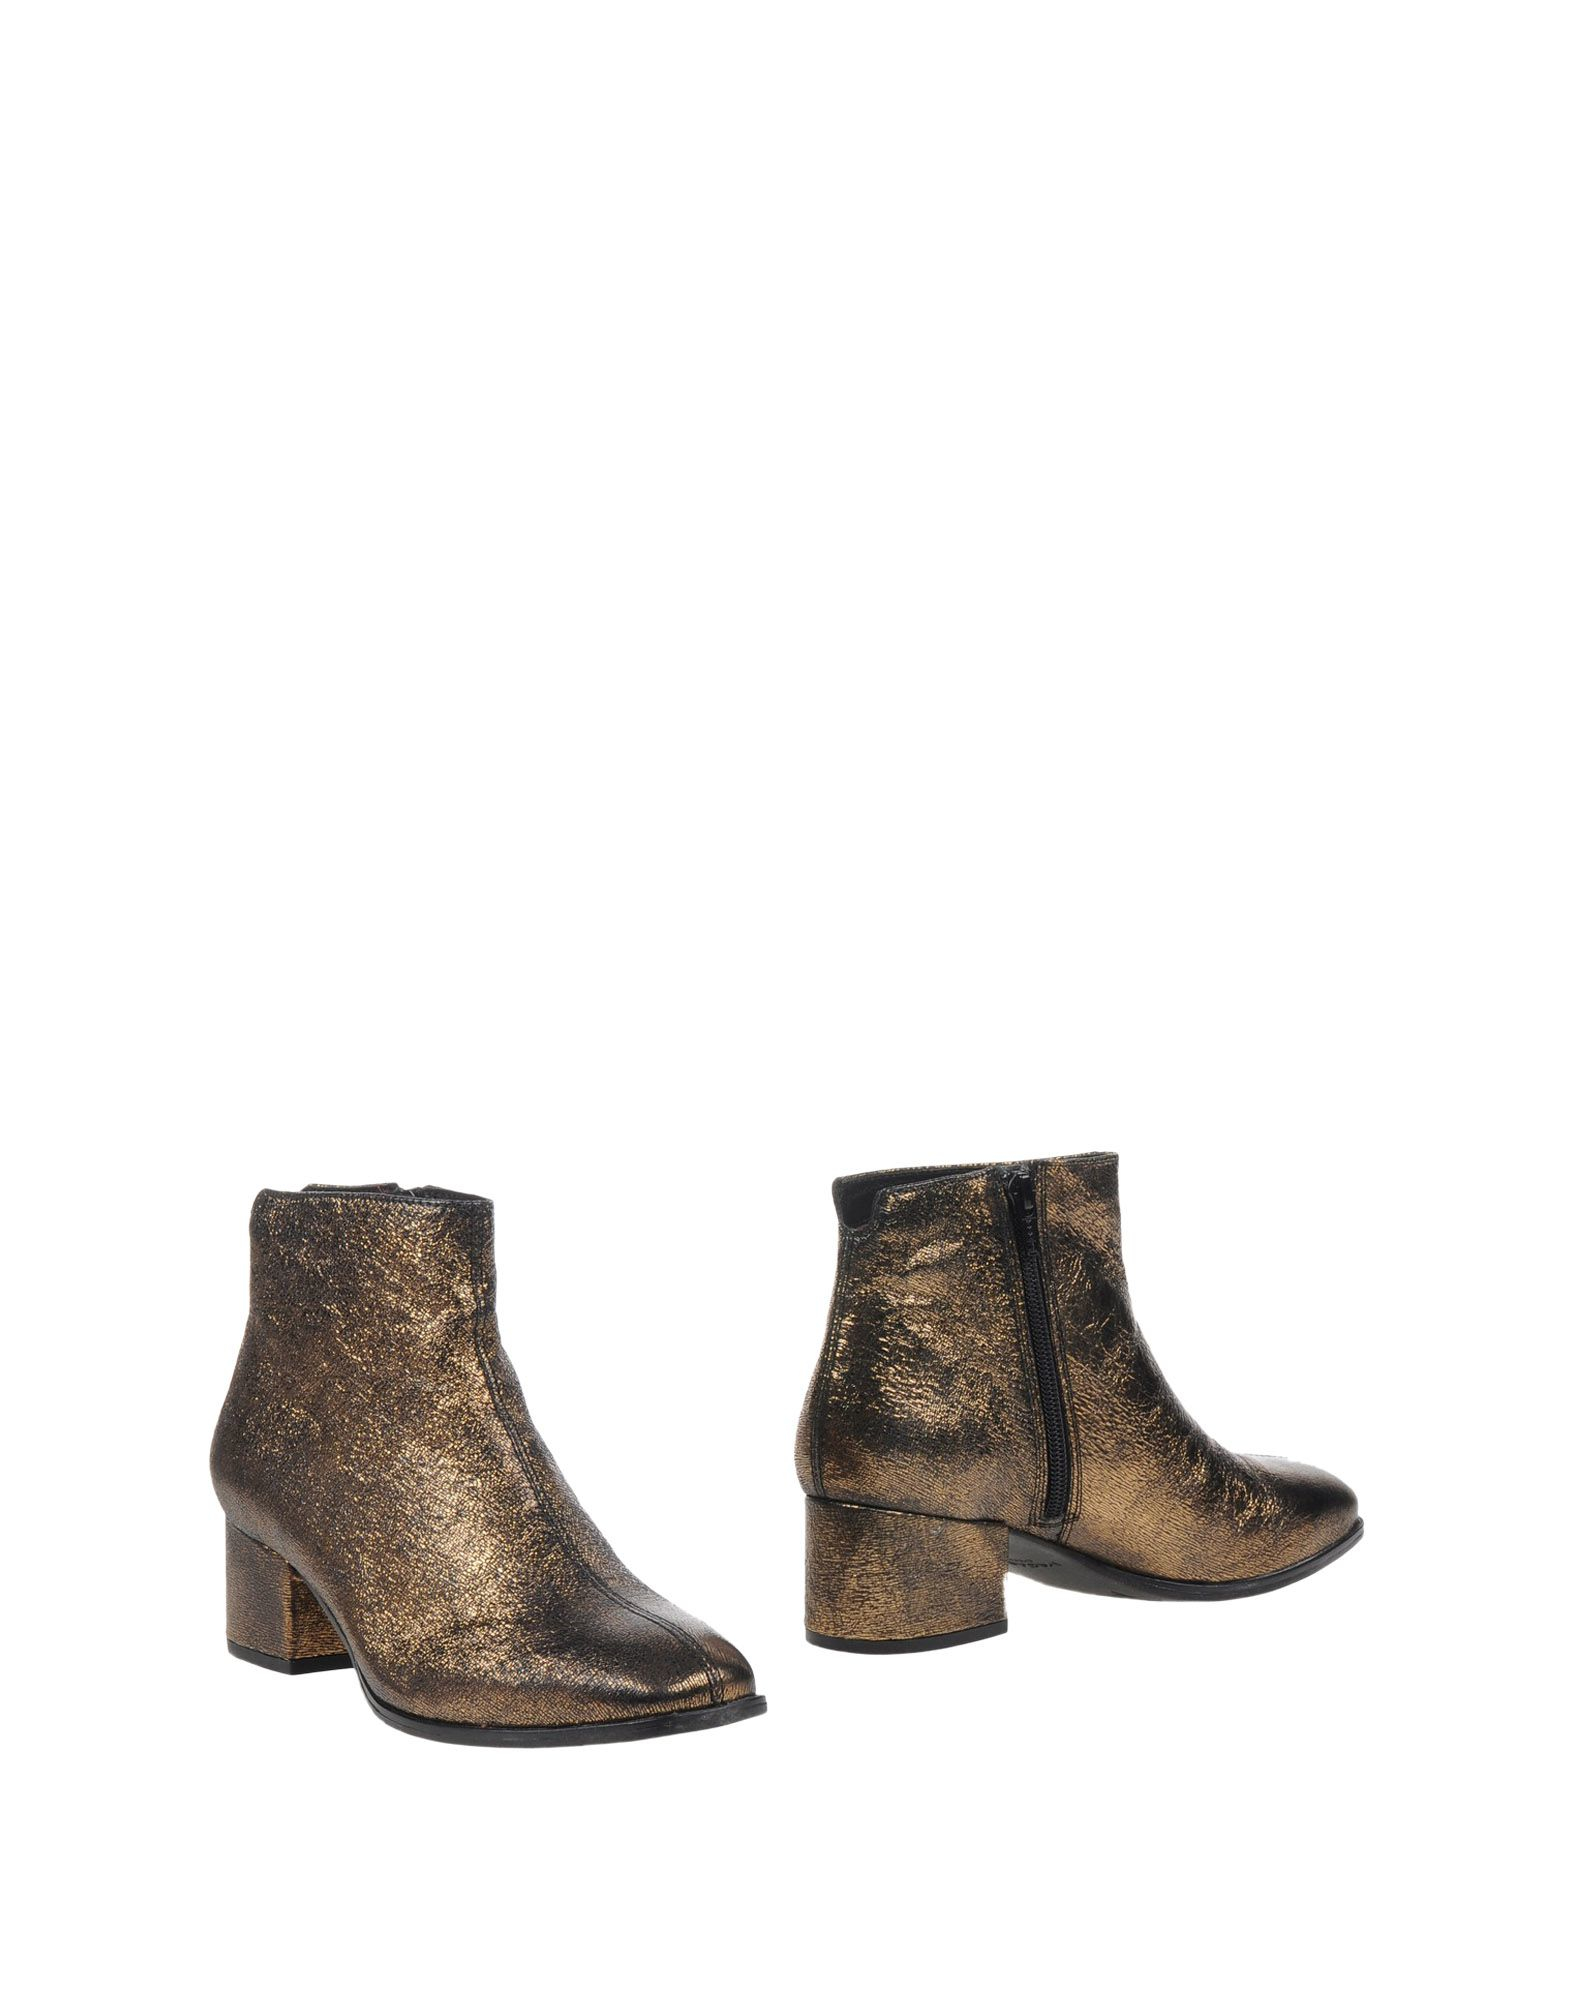 vagabond ankle boots in brown lyst. Black Bedroom Furniture Sets. Home Design Ideas